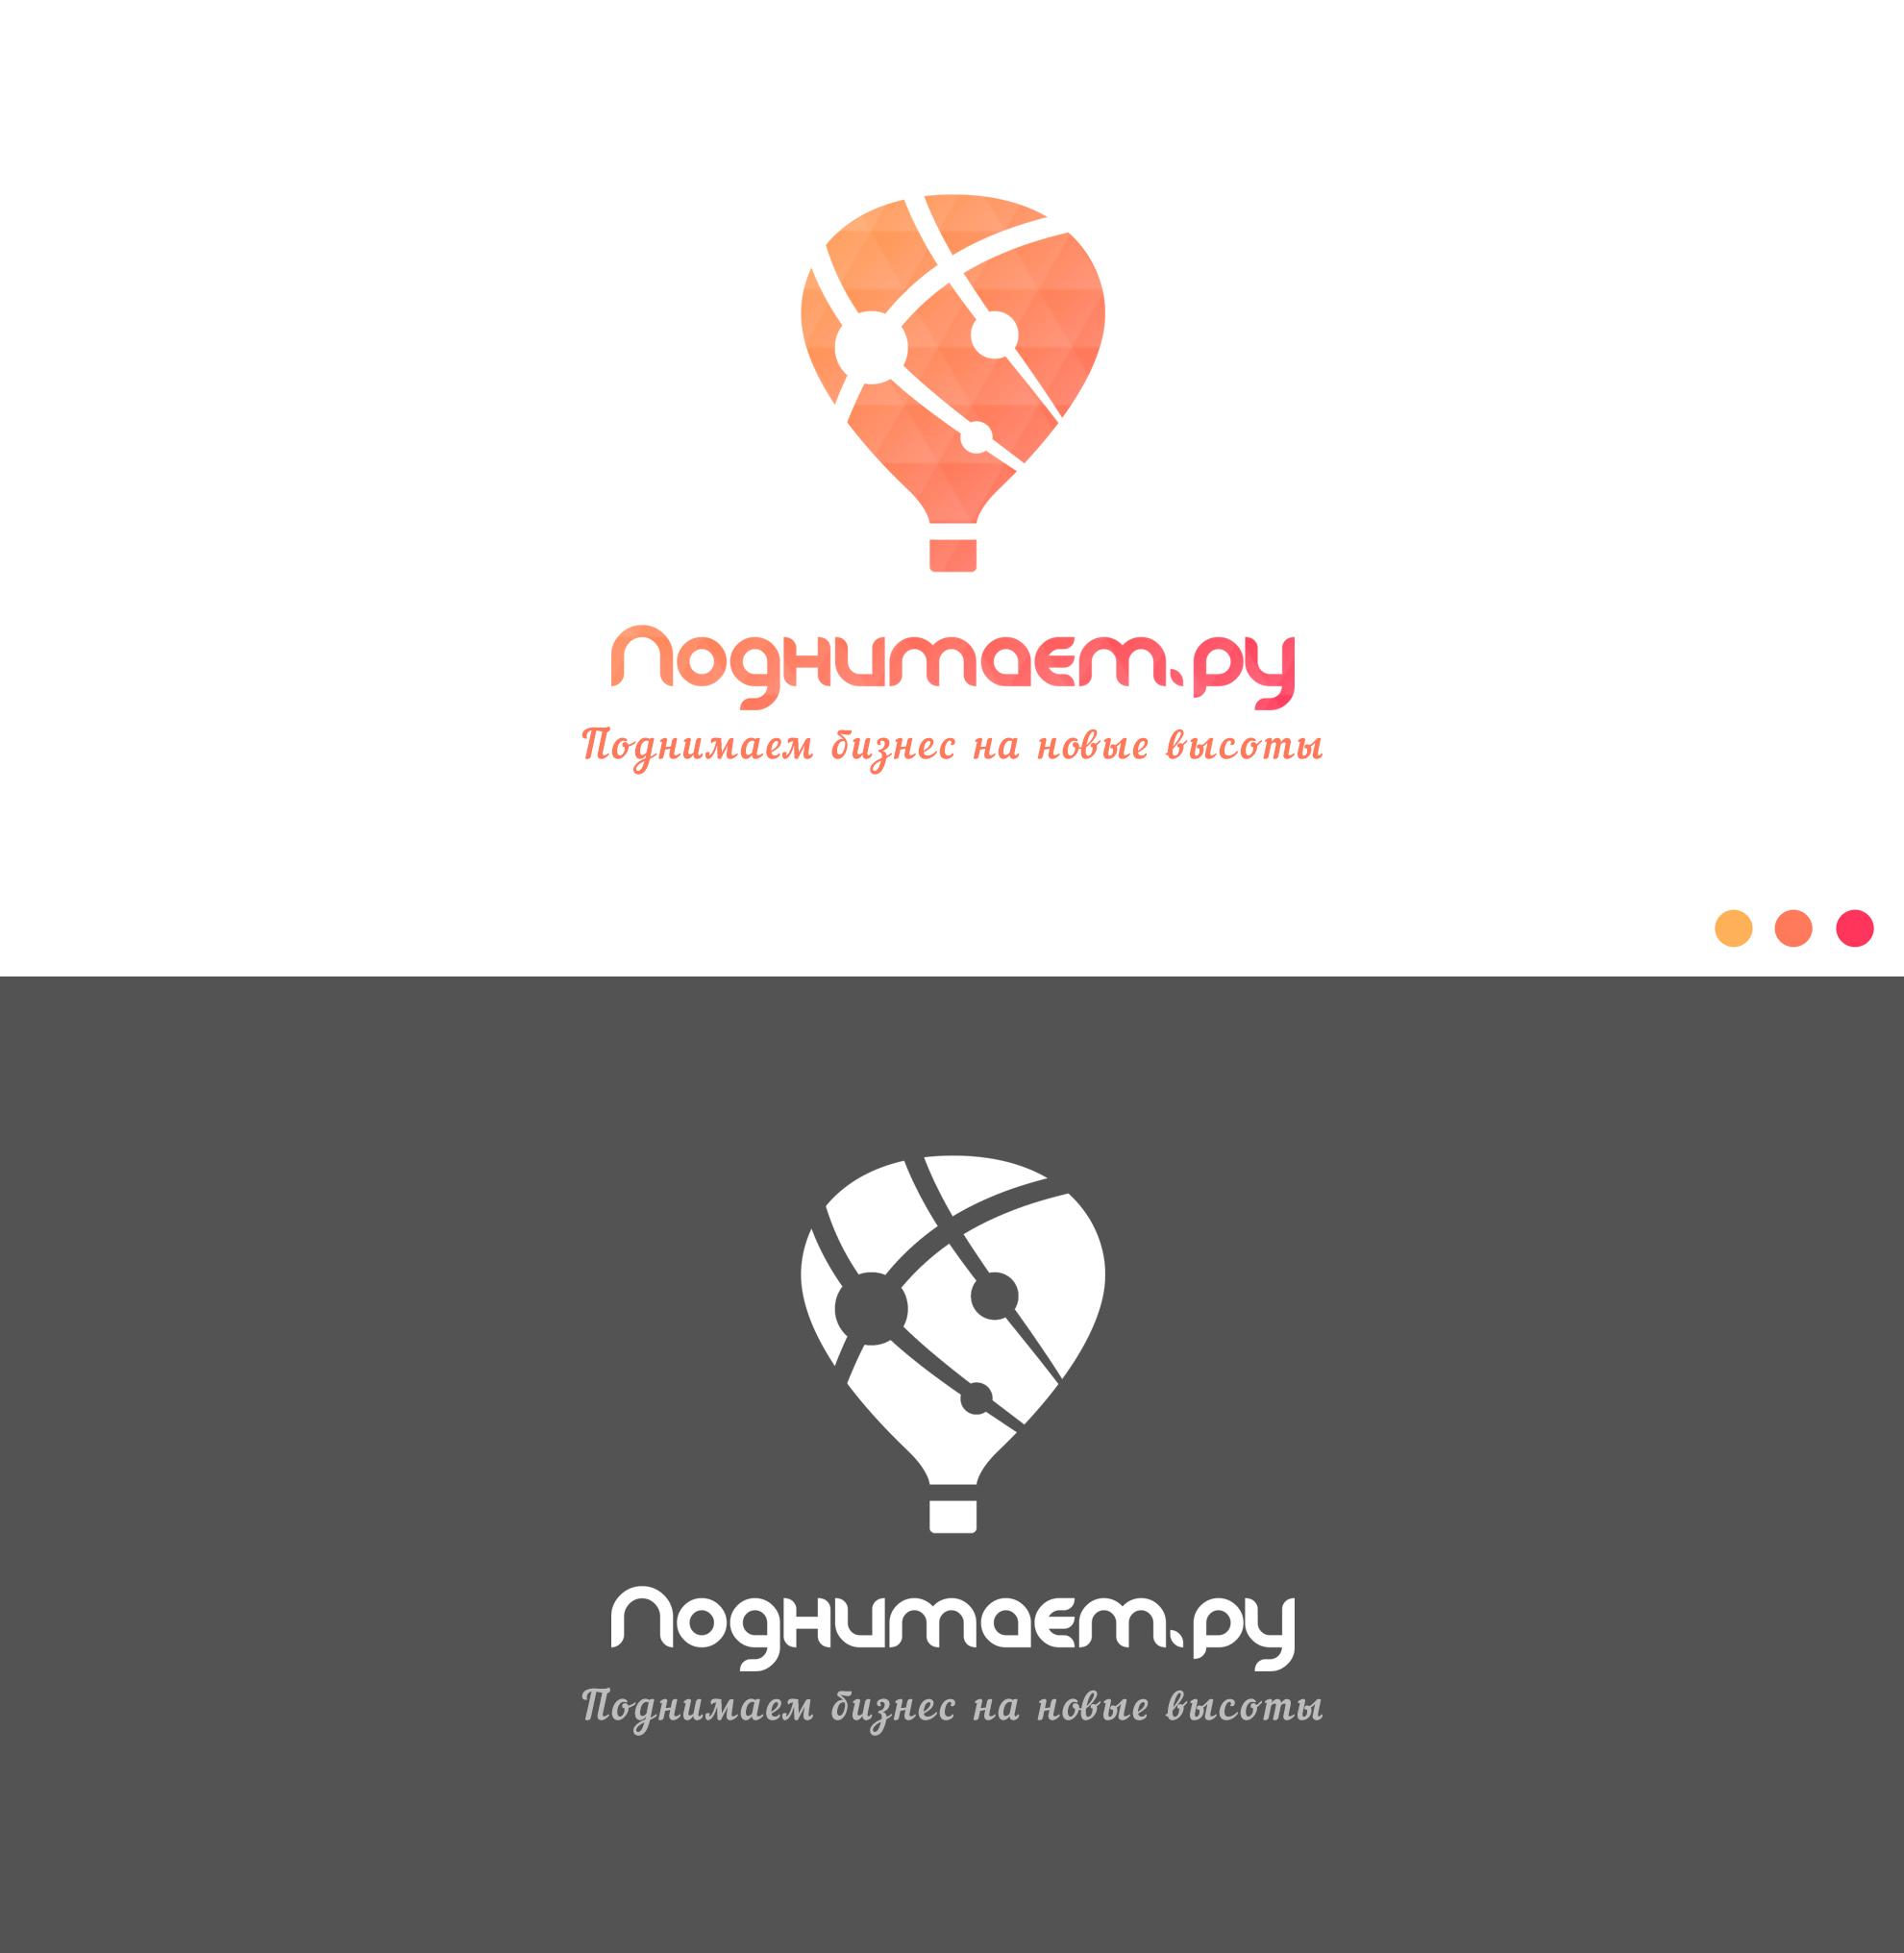 Разработать логотип + визитку + логотип для печати ООО +++ фото f_970554654ead031a.jpg